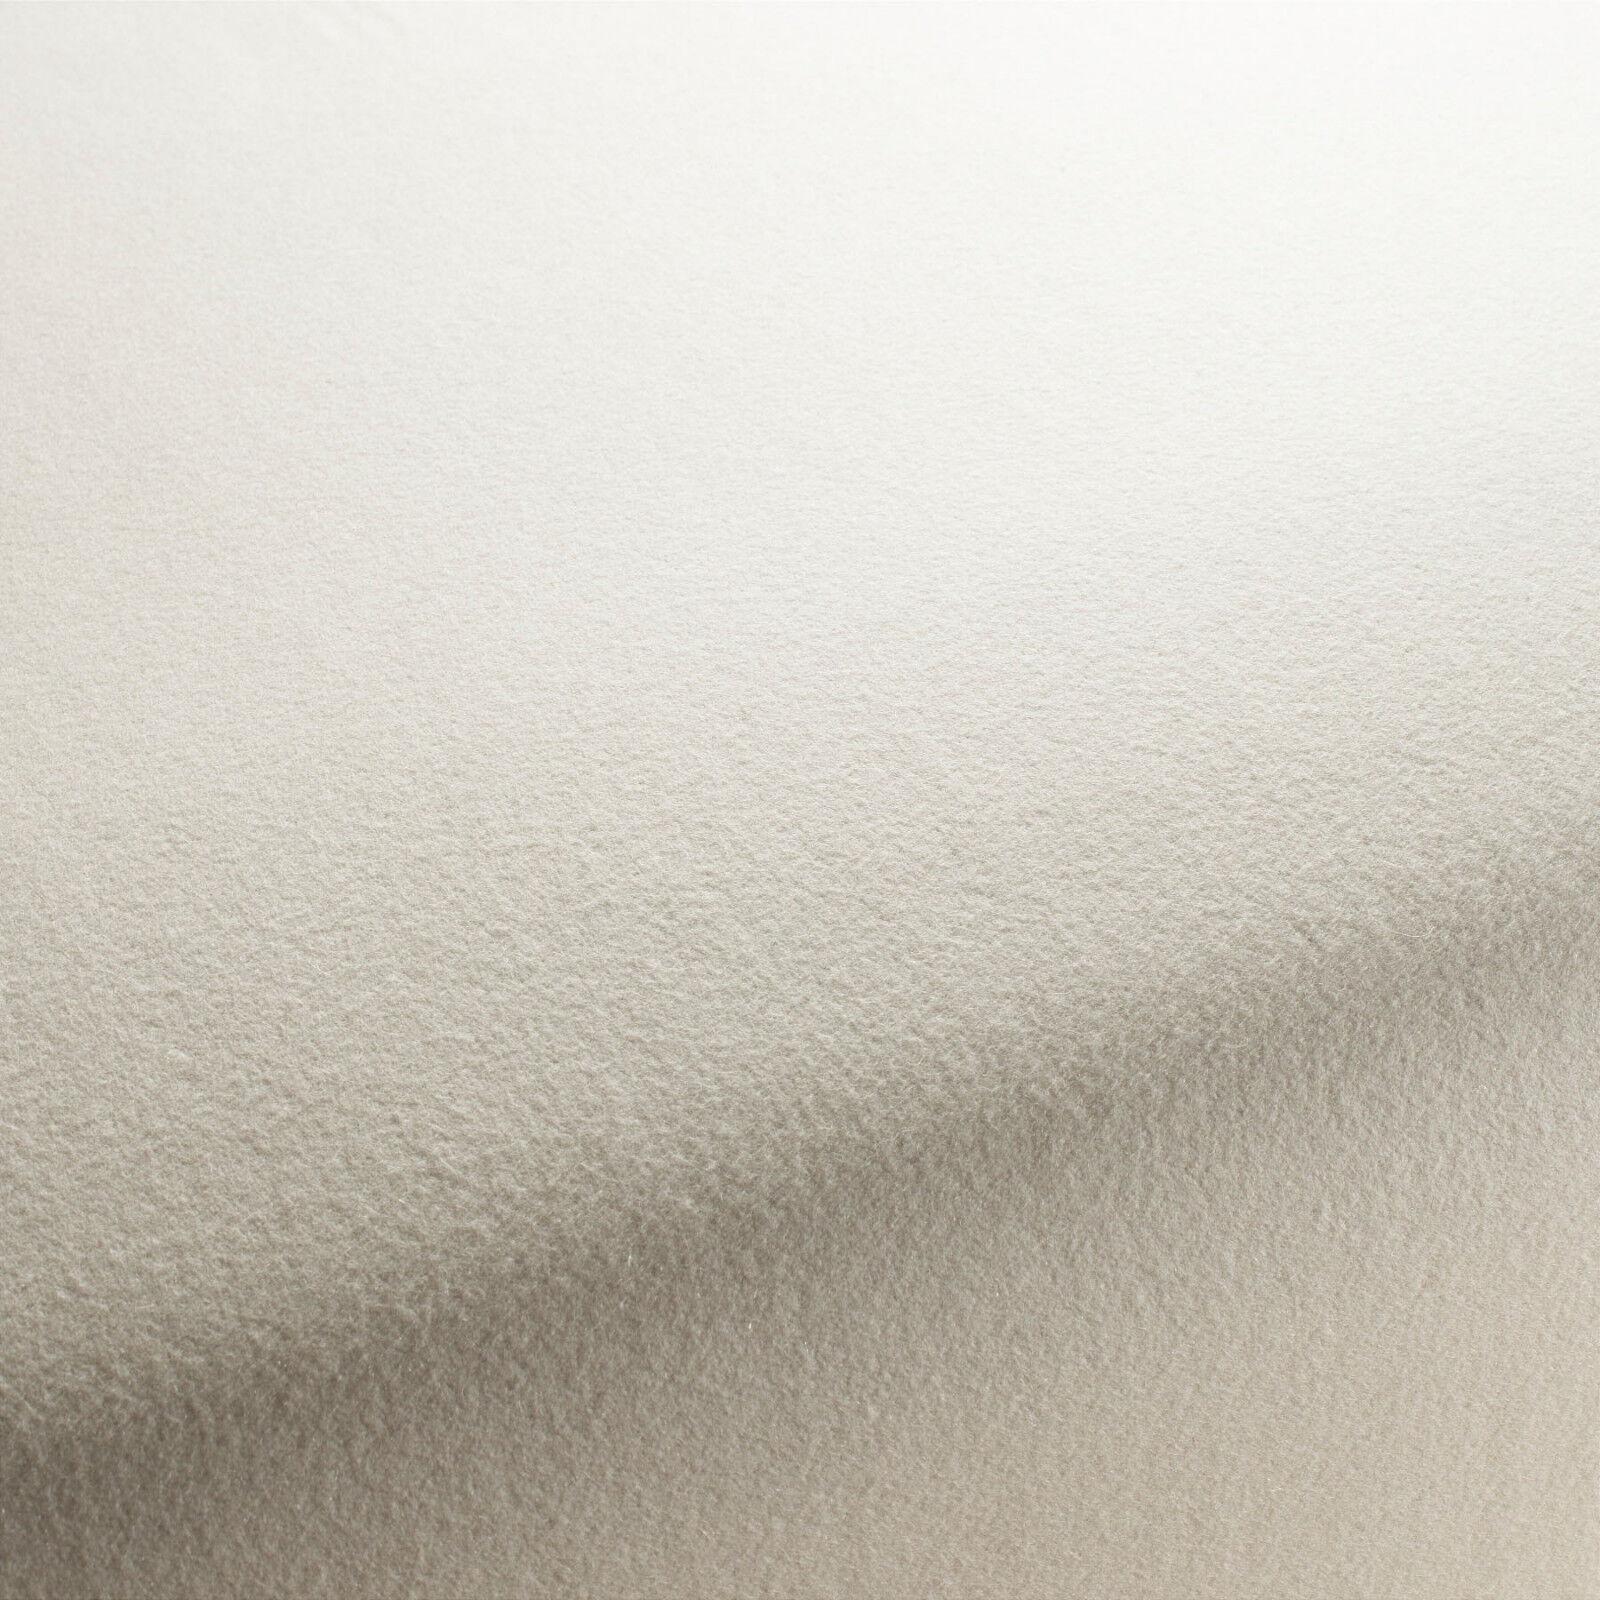 stoffdesign  COLUMBIA klassischer Woll-Stoff nussbraun  polstern polstern polstern upolsteryCA f4a5f5